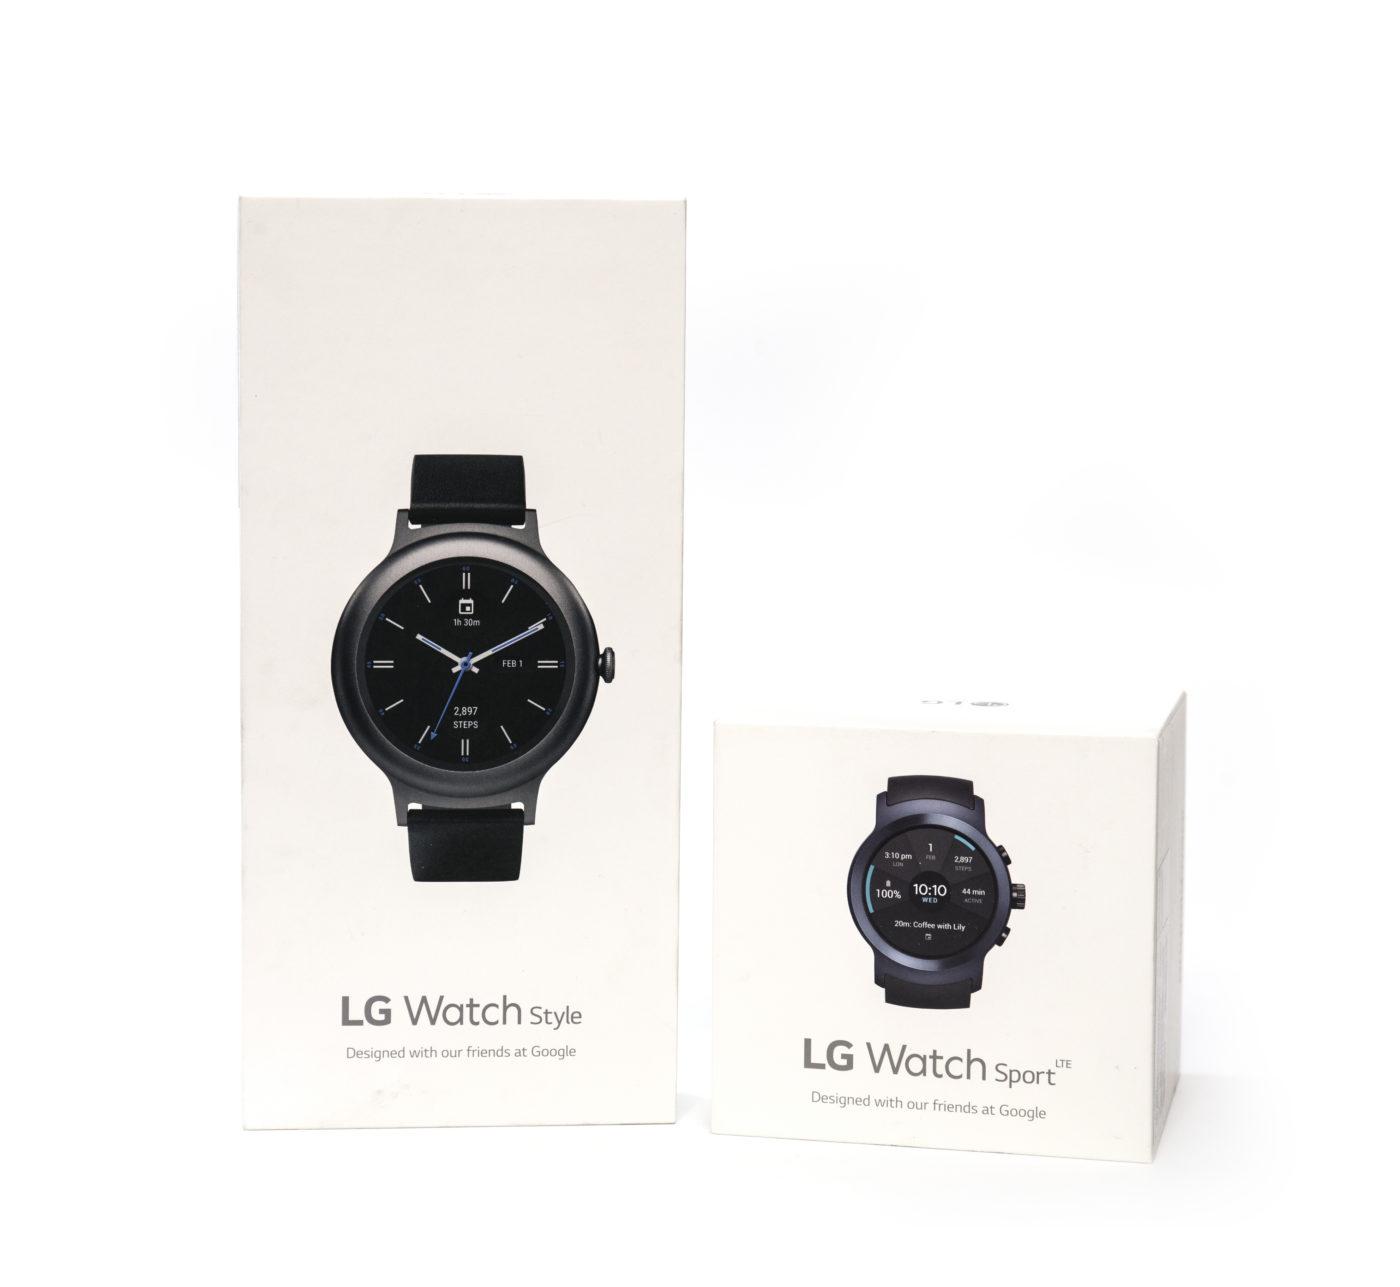 LG Watch Sport/Style 智慧手錶開箱動手玩 [影片] [規格表] @3C 達人廖阿輝